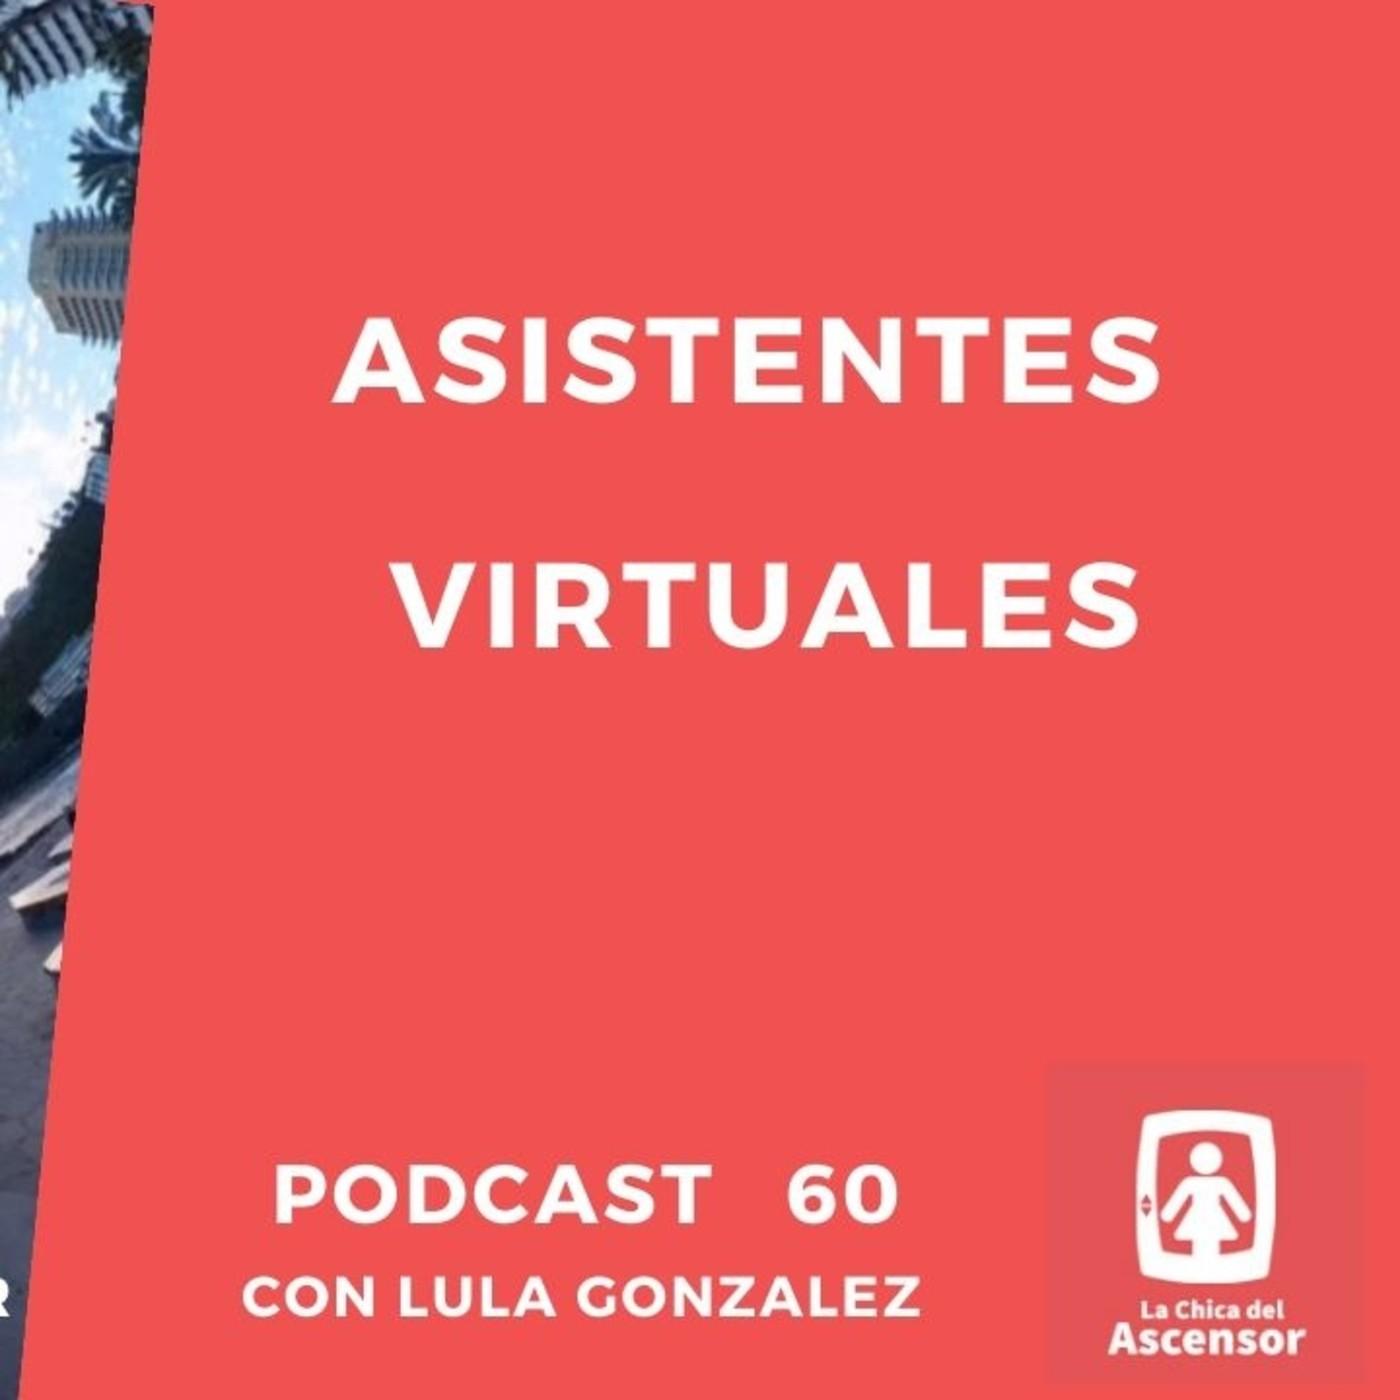 60 - Asistentes virtuales como alternativa a un administrativo